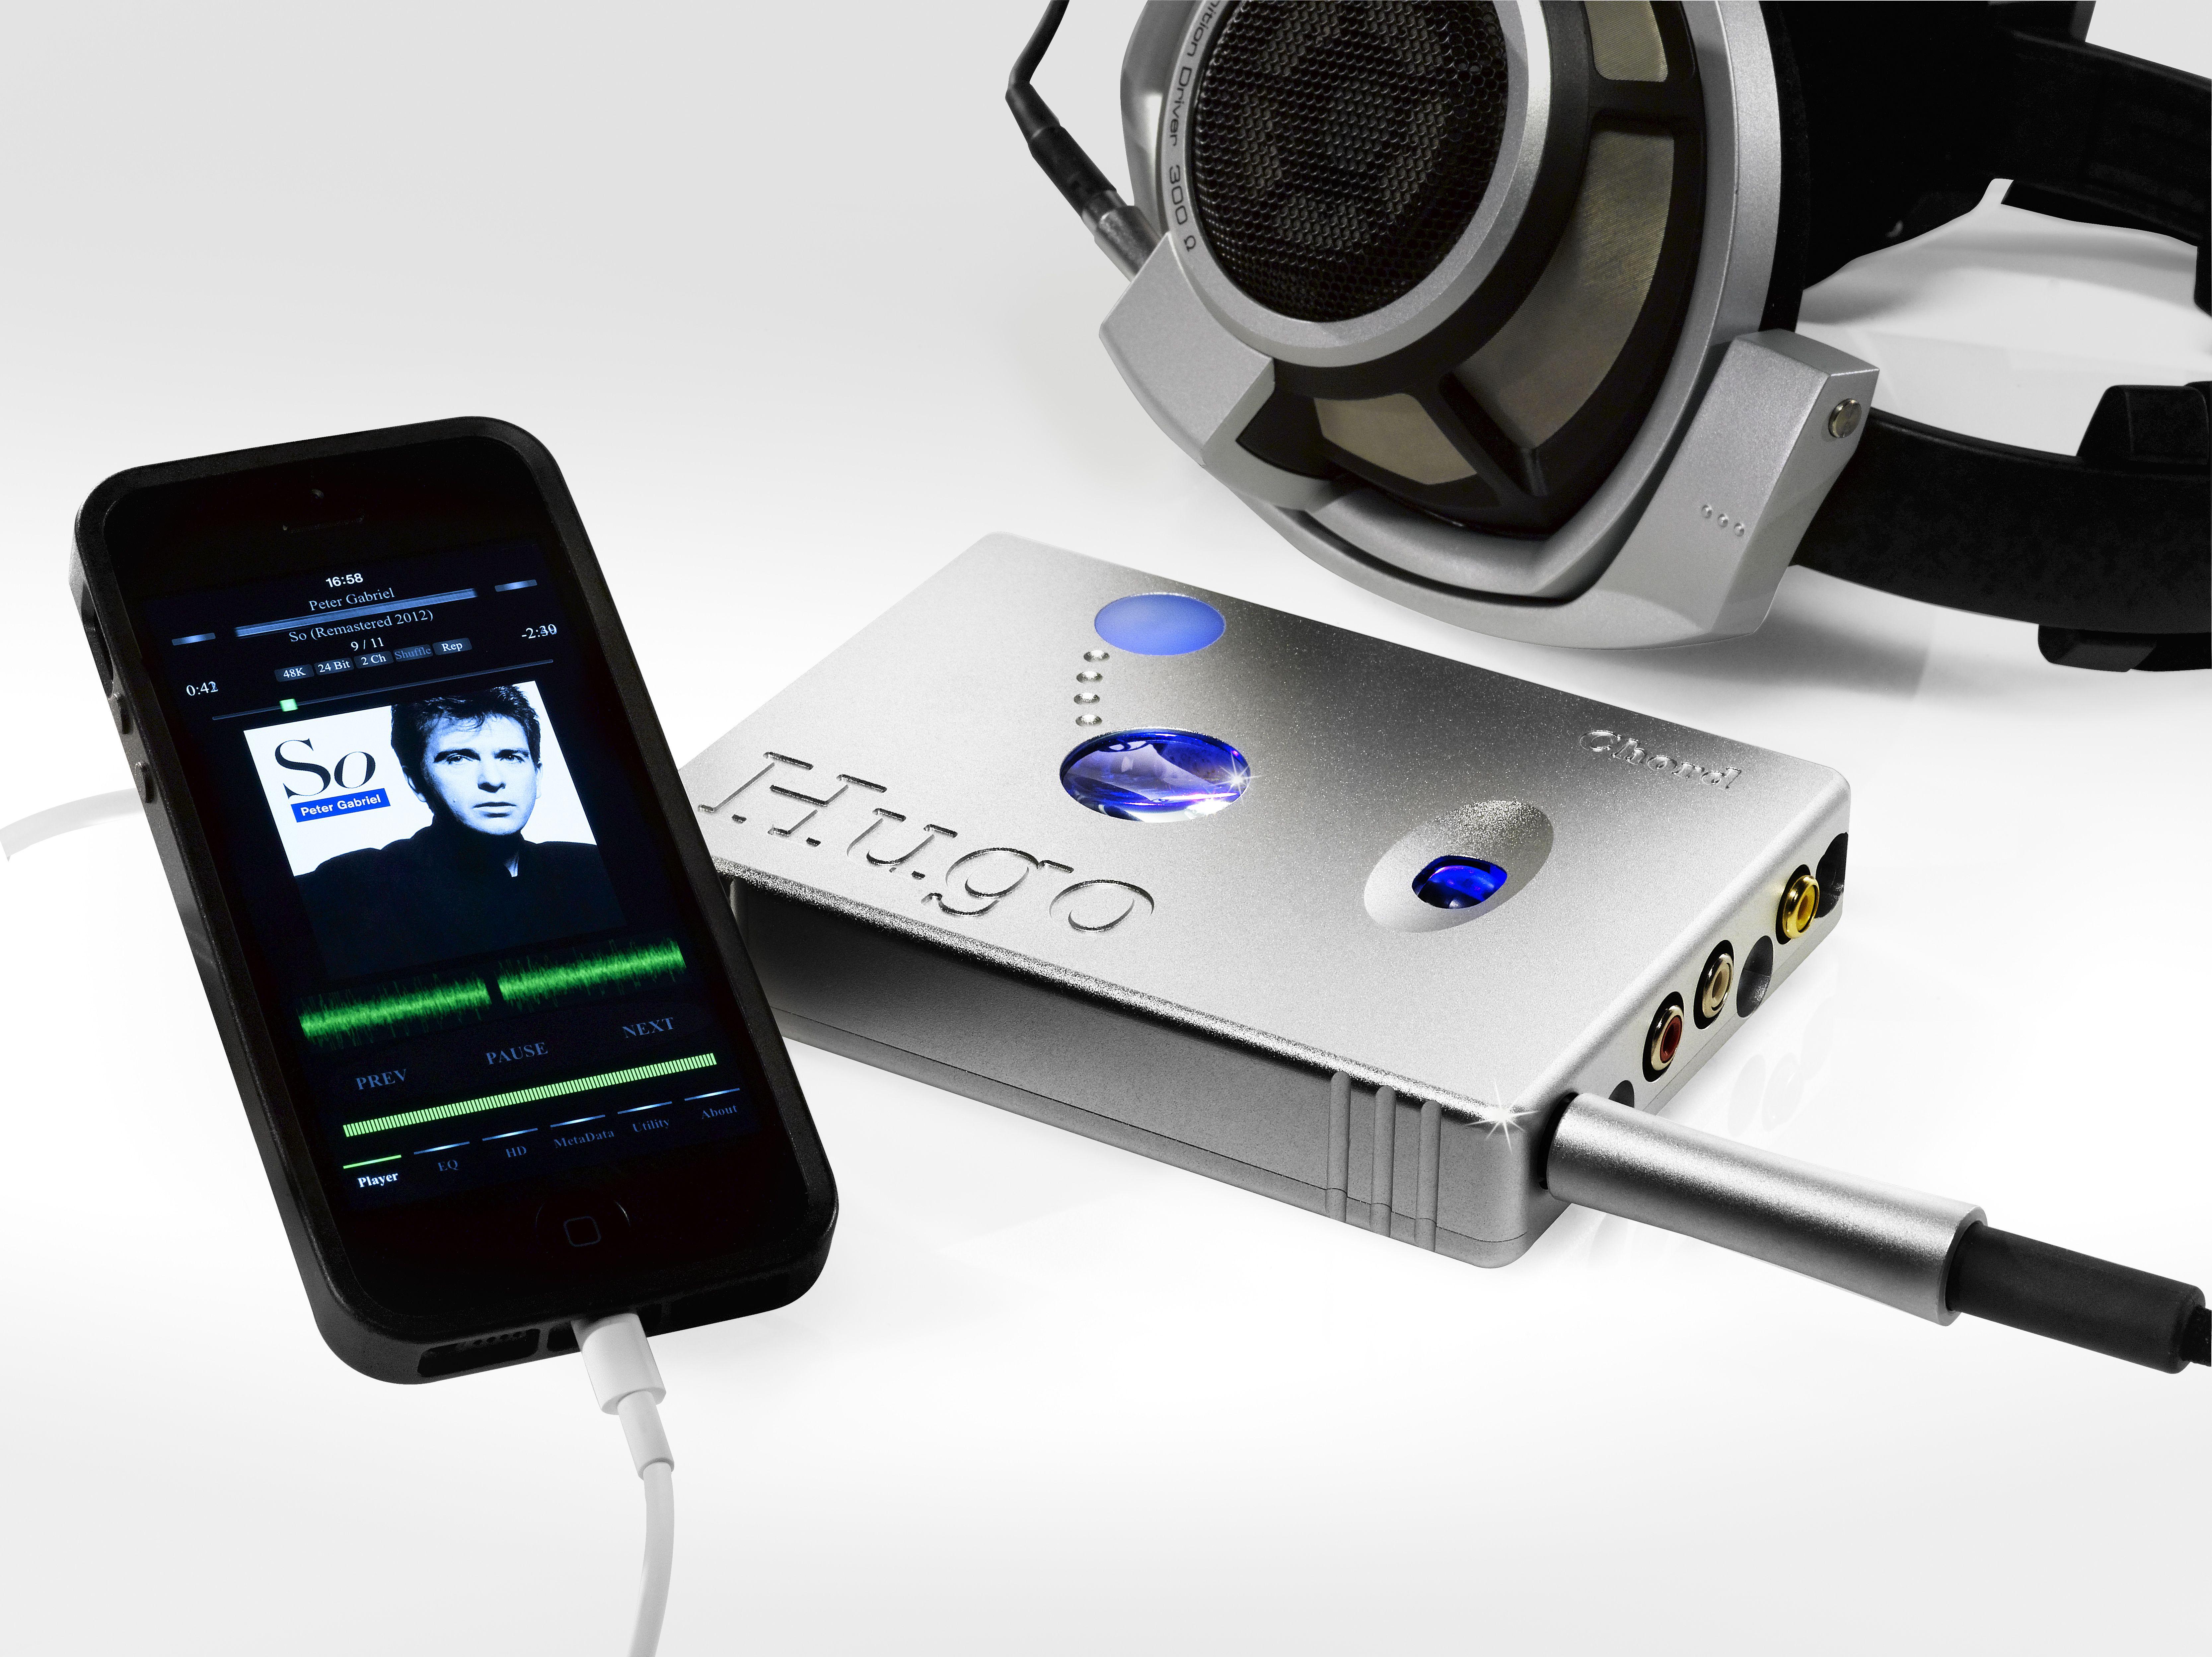 Hugo is a multiawardwinning mobile DAC and headphone